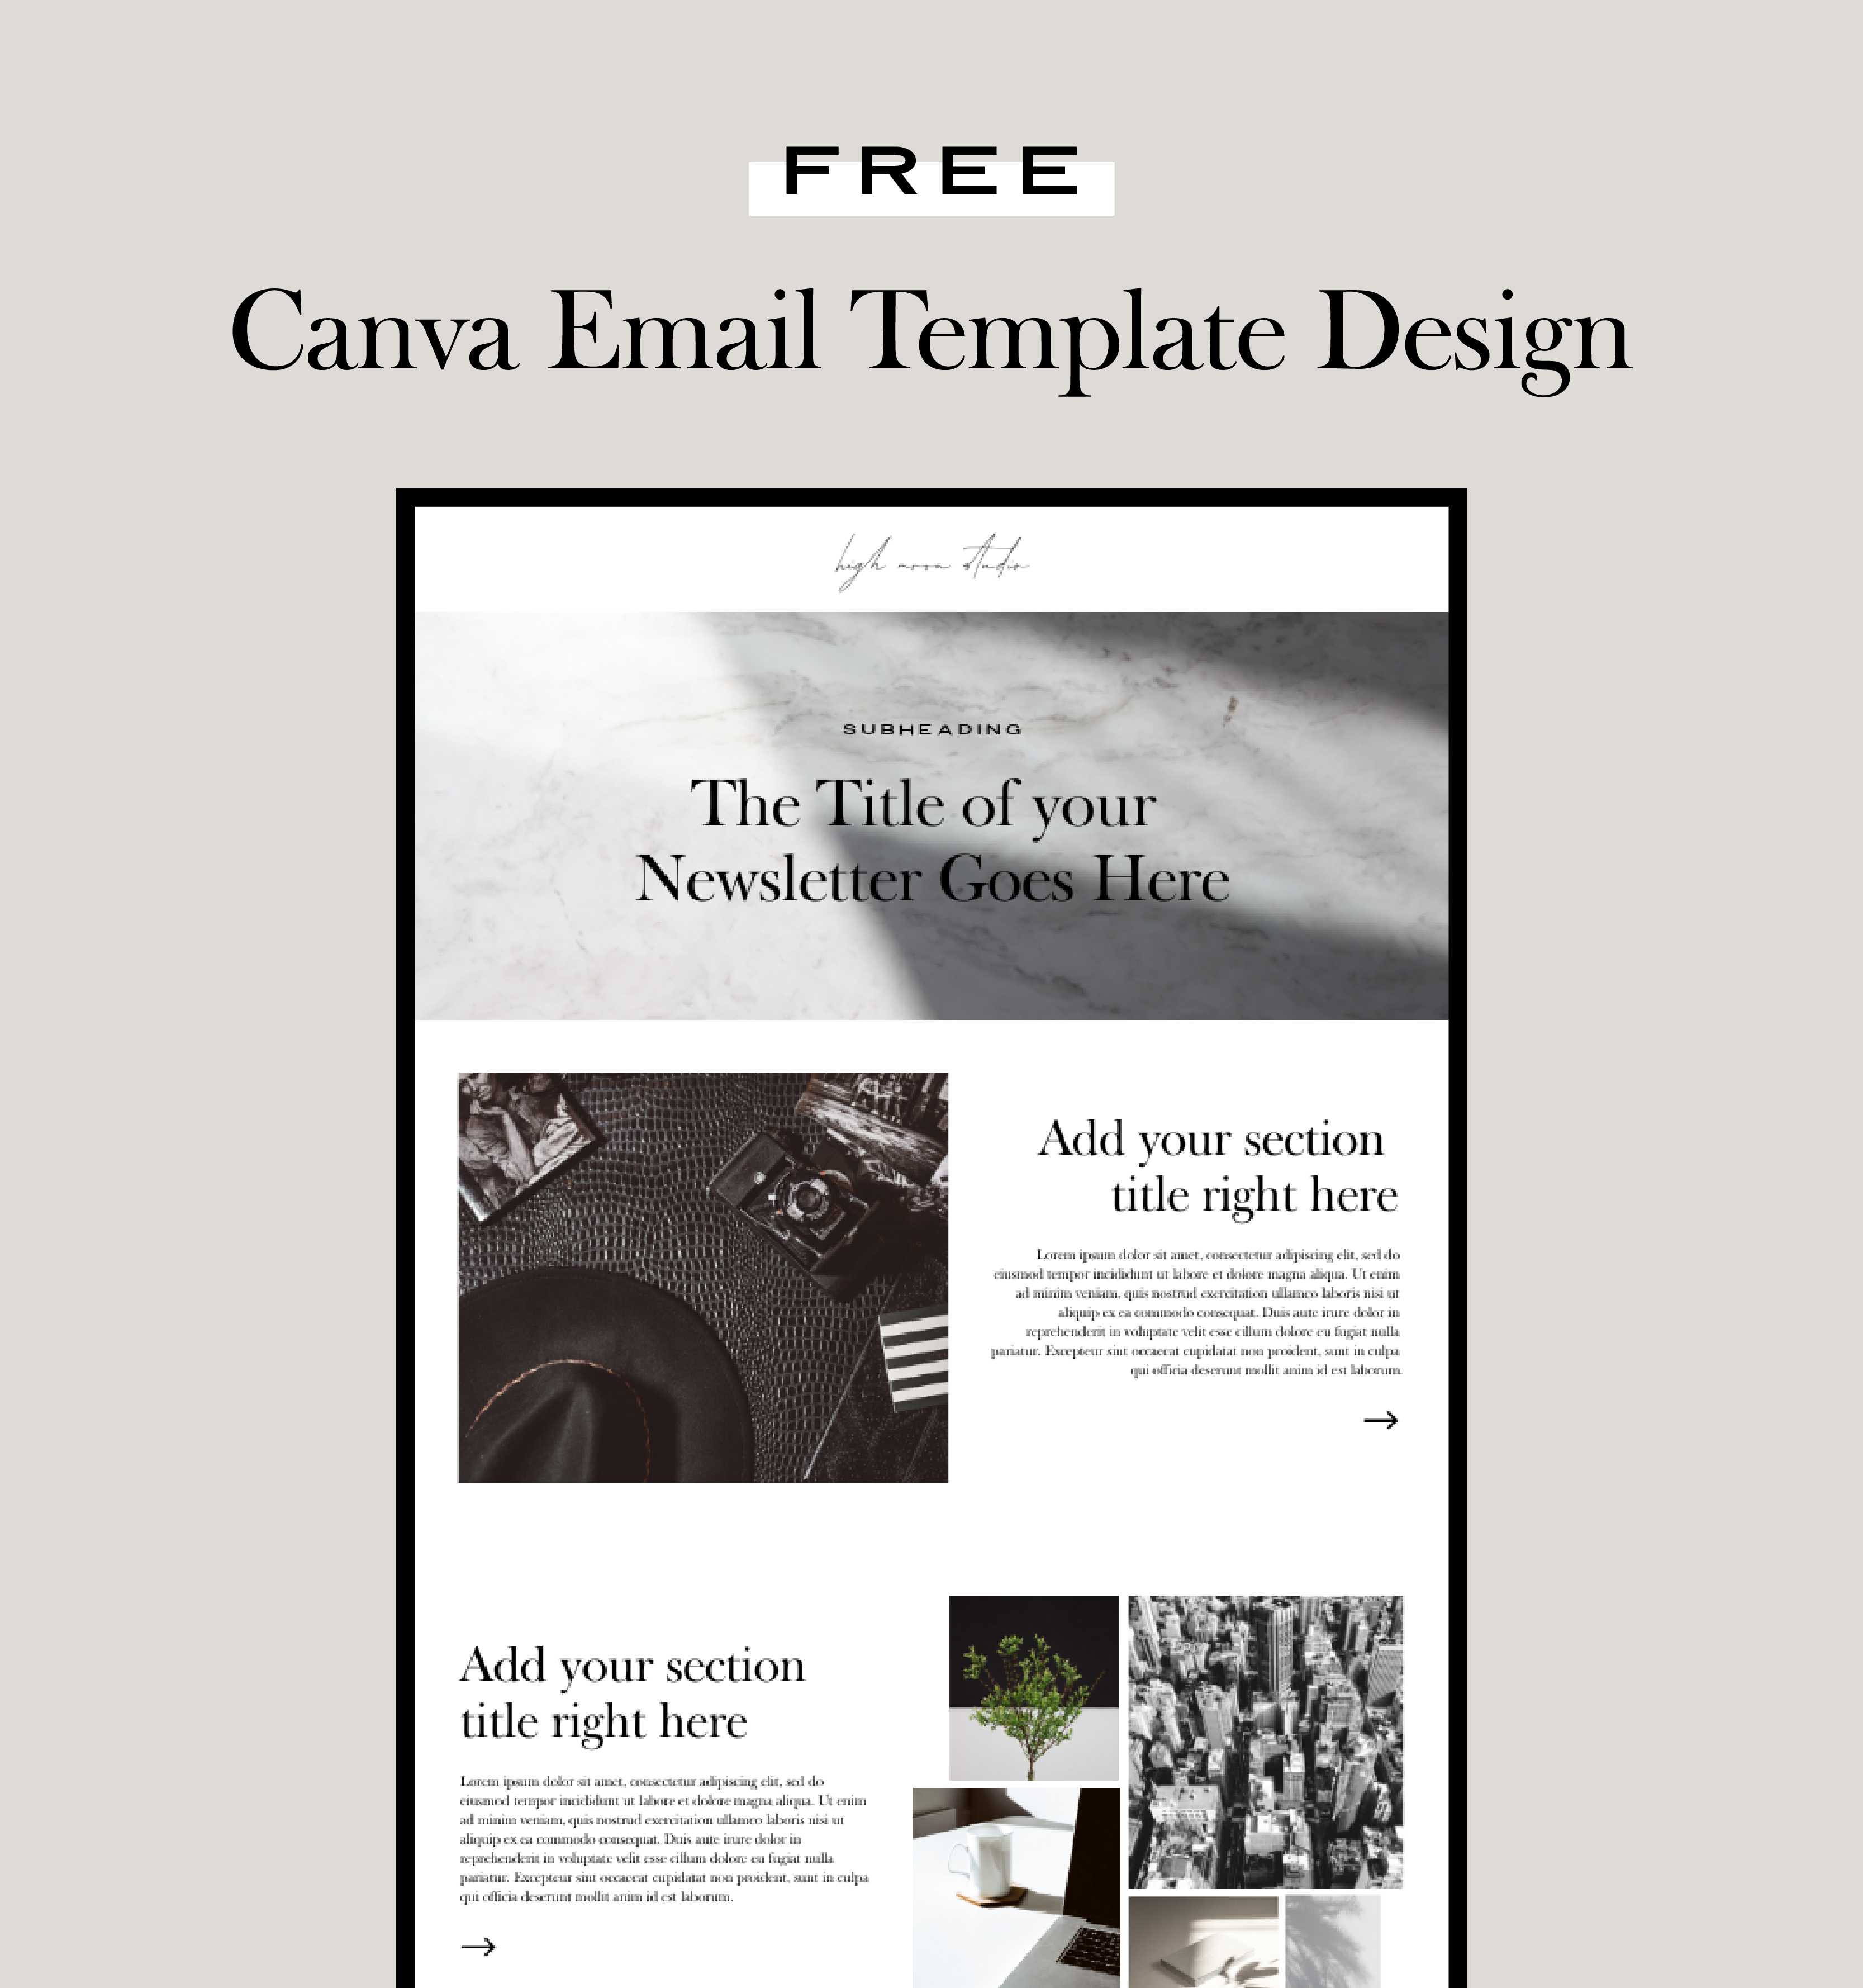 canva canvatemplate emaildesign emailnewsletter